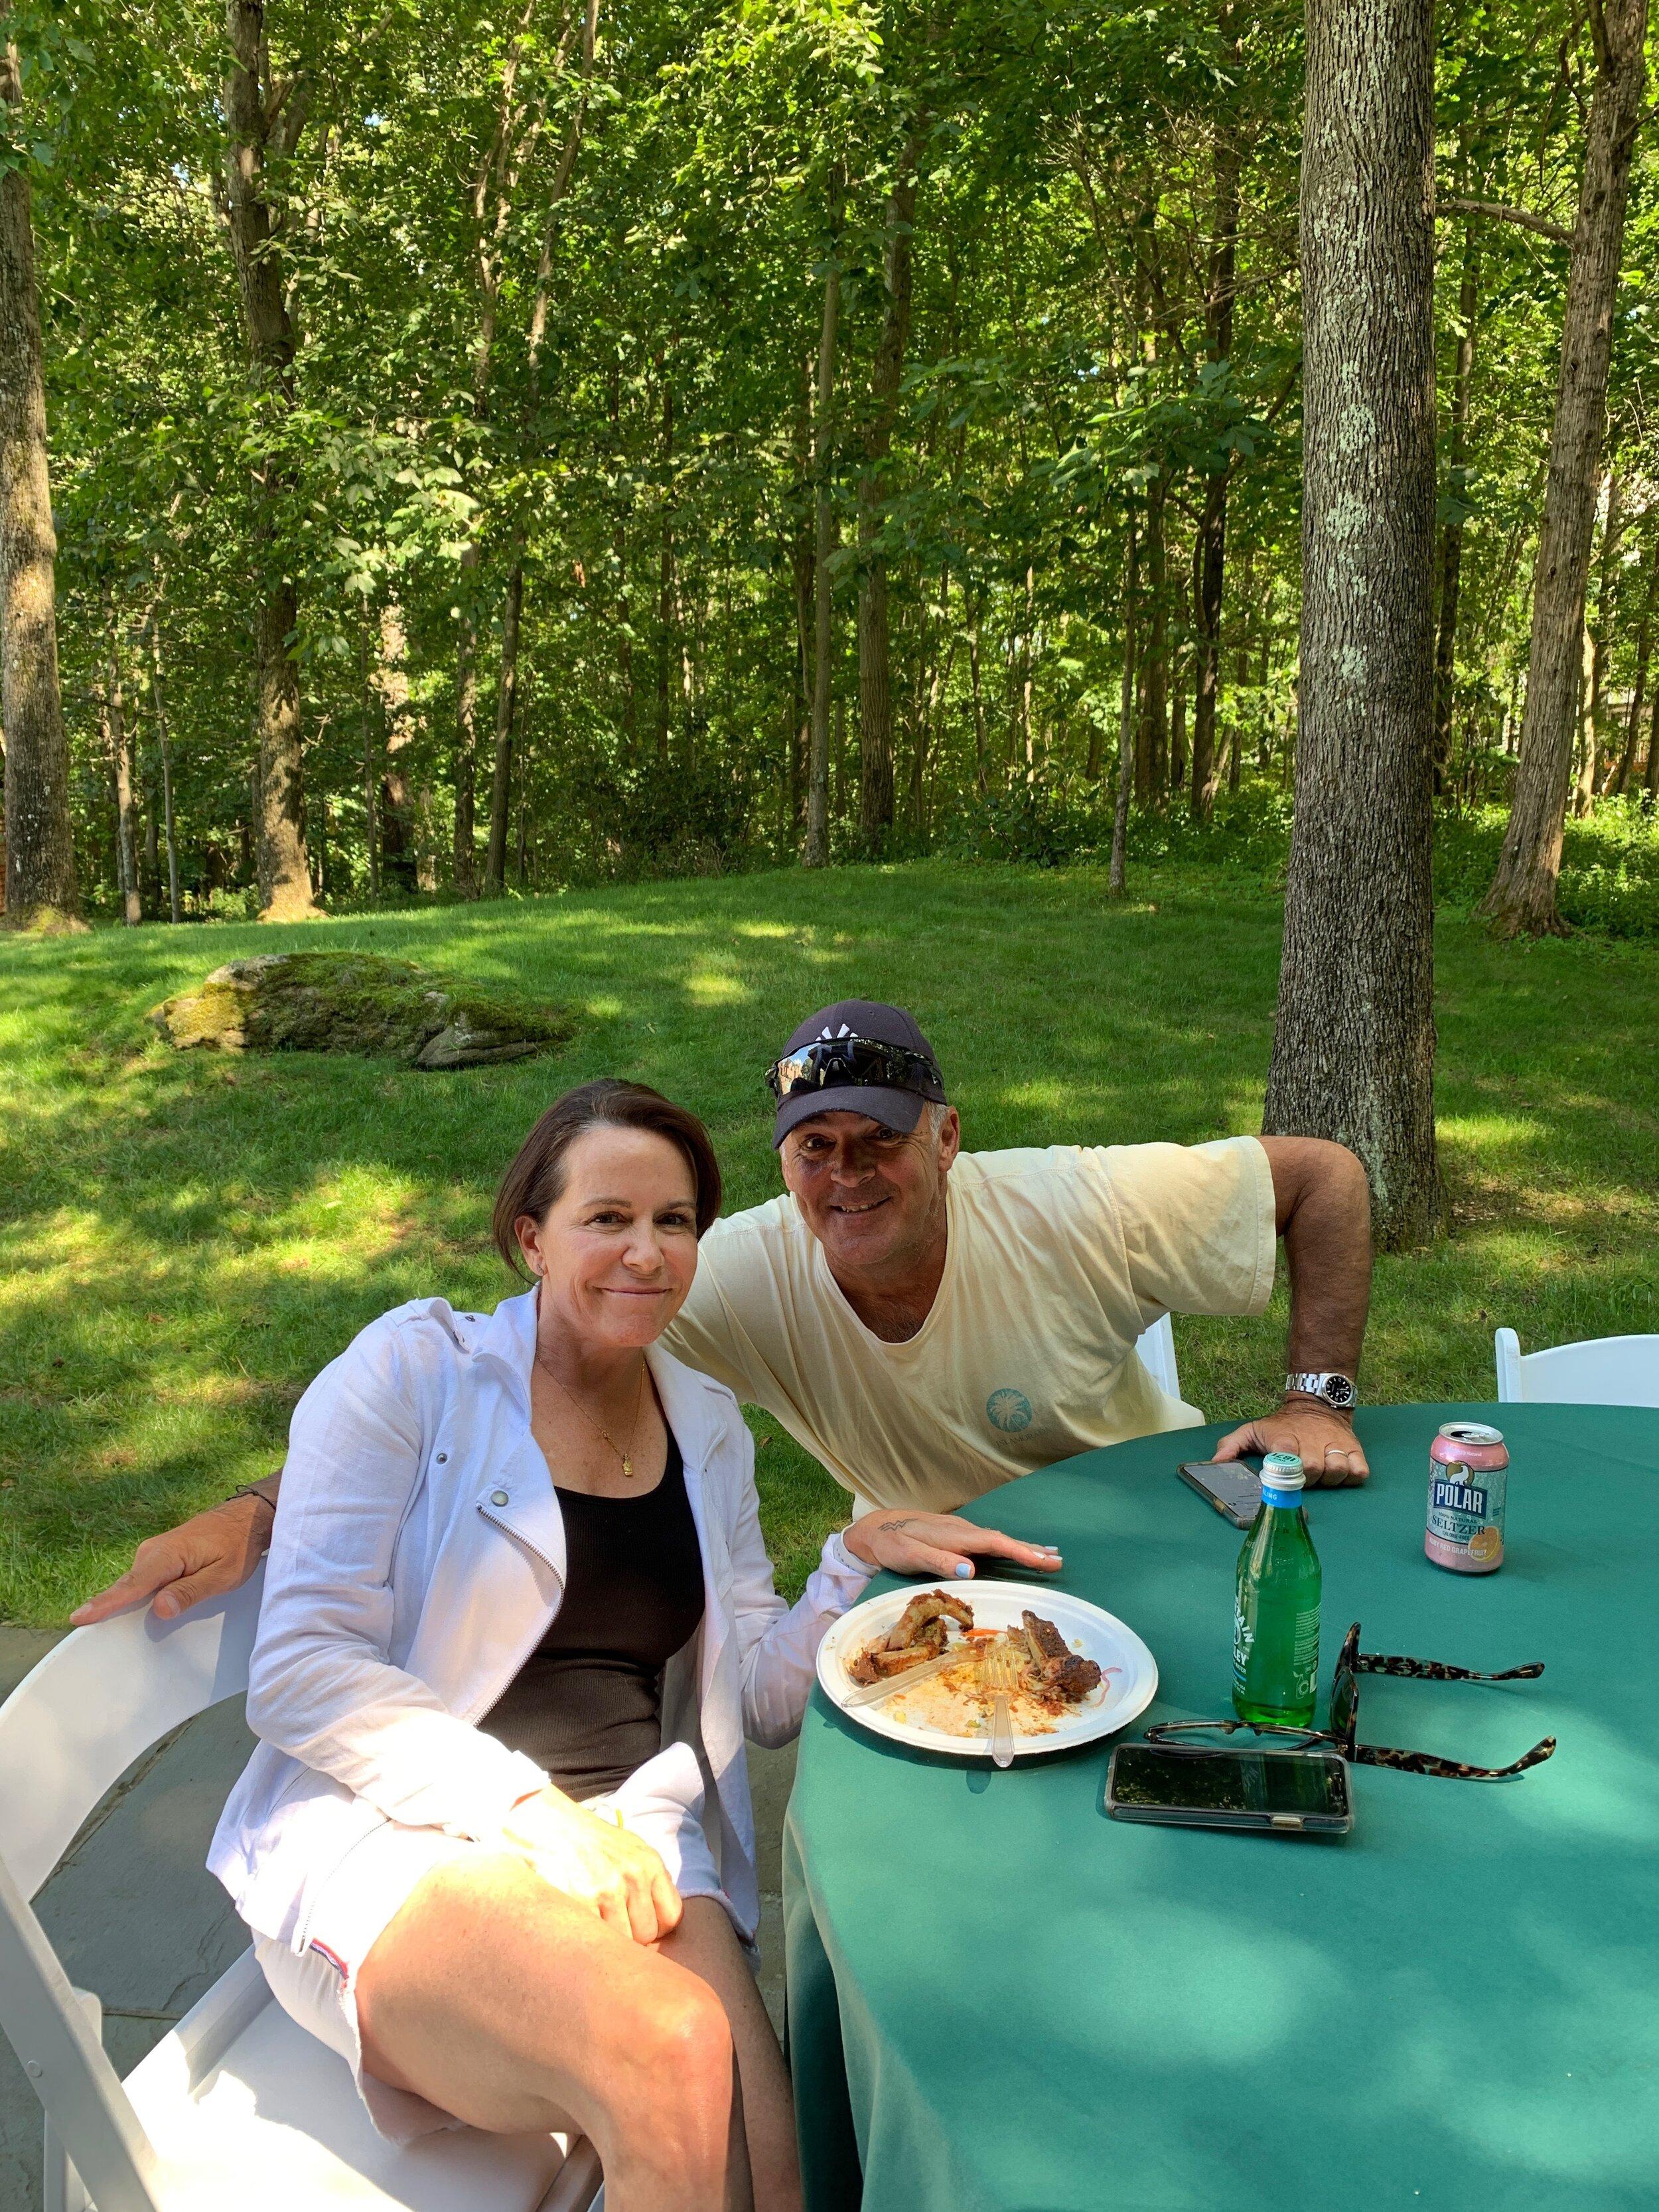 Lighthouse Recovery Coach, David Czaja and his wife Photographer Charisse Czaja